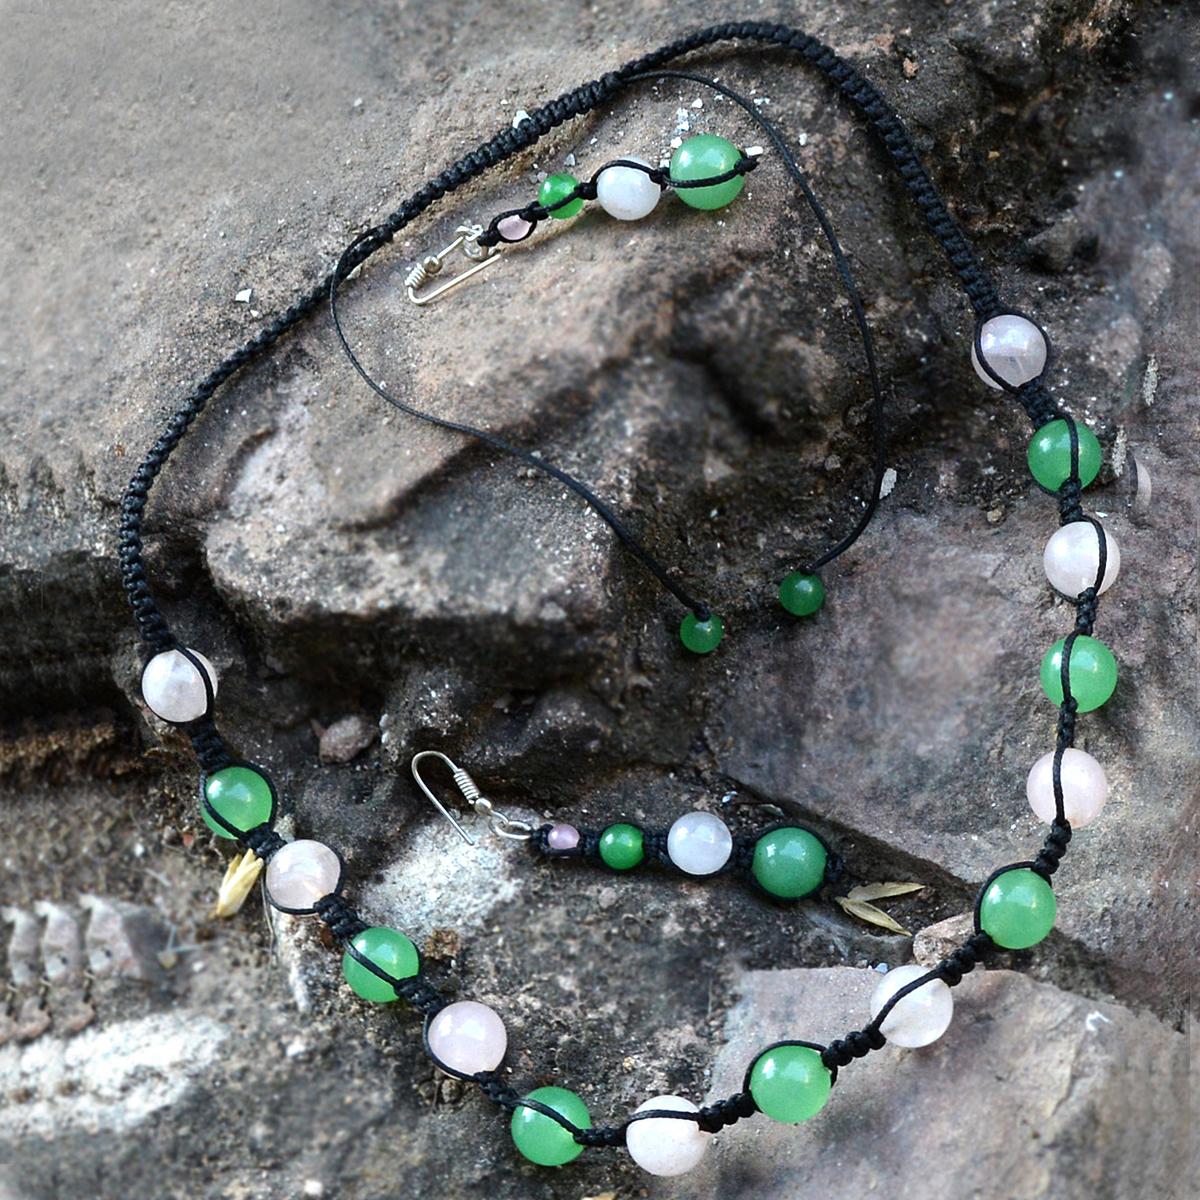 4-10mm Beaded Handmade Jewelry Manufacturer Green Jade & Rose Quartz 925 Sterling Silver Jaipur Rajasthan India Necklace Set